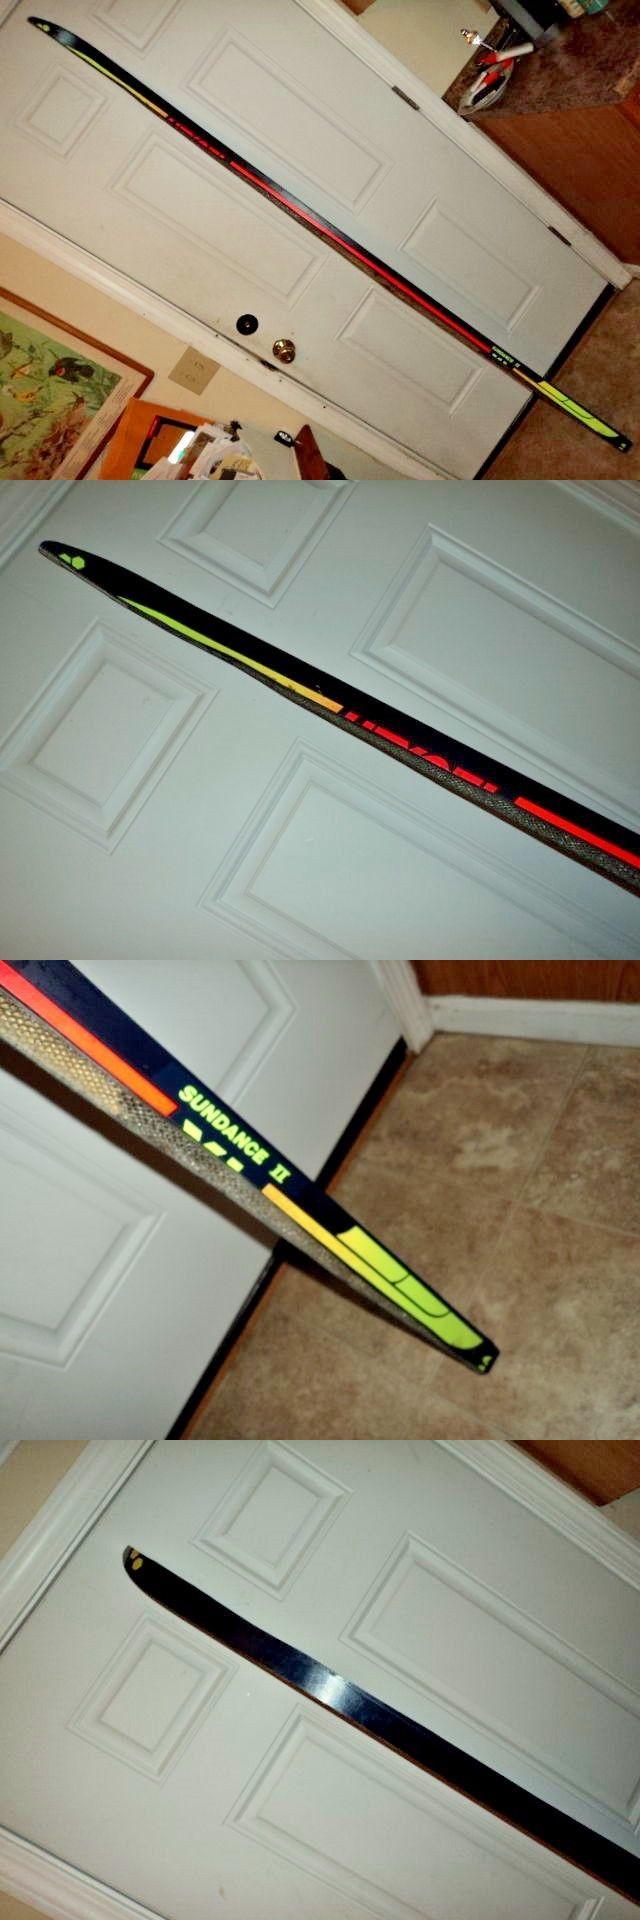 Other Team Sports 159133: Vintage Hexcel Sundance Ii Store Cutaway Demonstrator Ski -> BUY IT NOW ONLY: $75 on eBay!